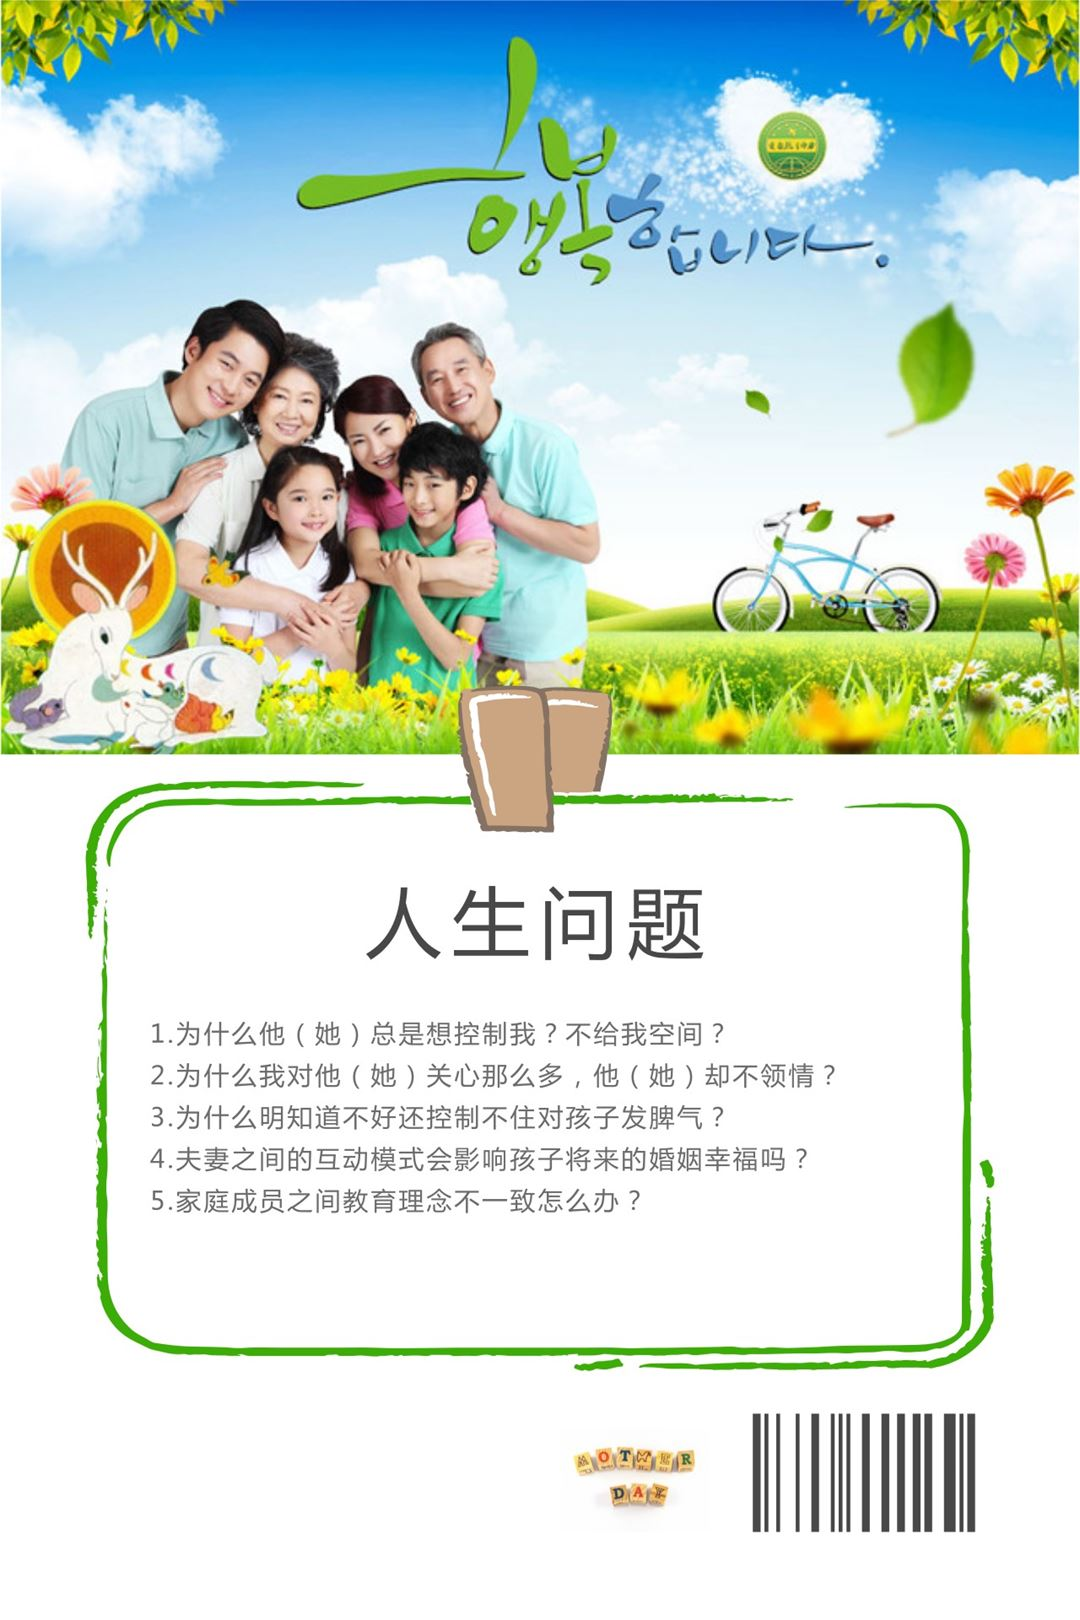 http://www.huodongxing.com/file/20180515/1003056949915/764176693845349.jpg